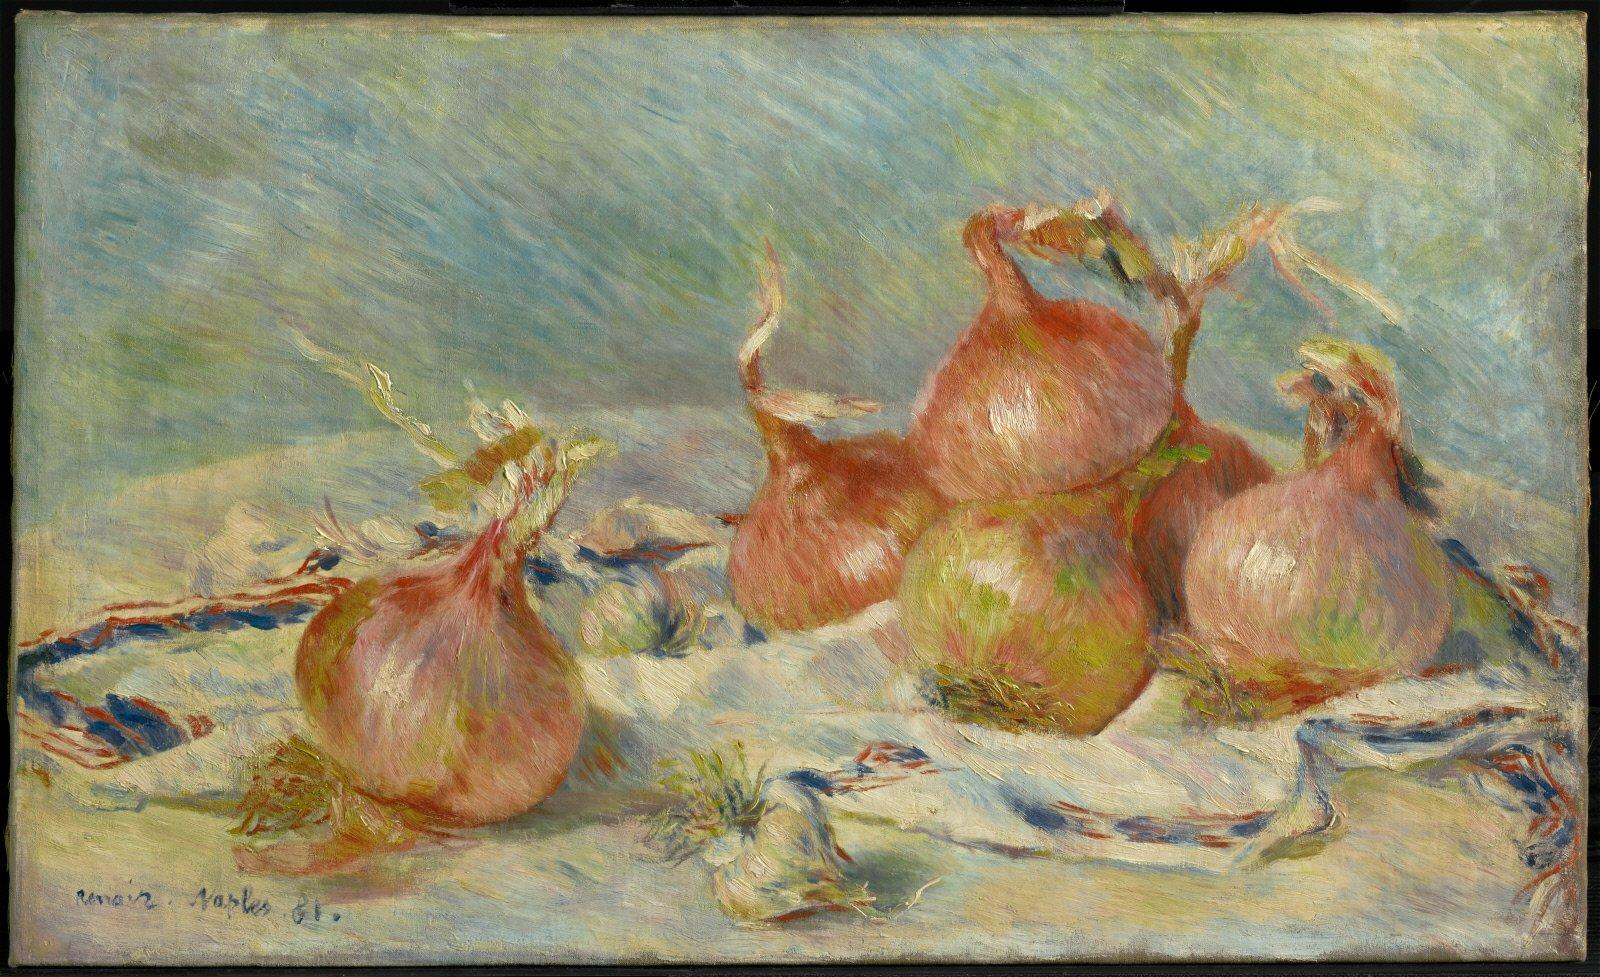 Pierre-Auguste Renoir, Onions, 1891. Recreated April 22, 2021.